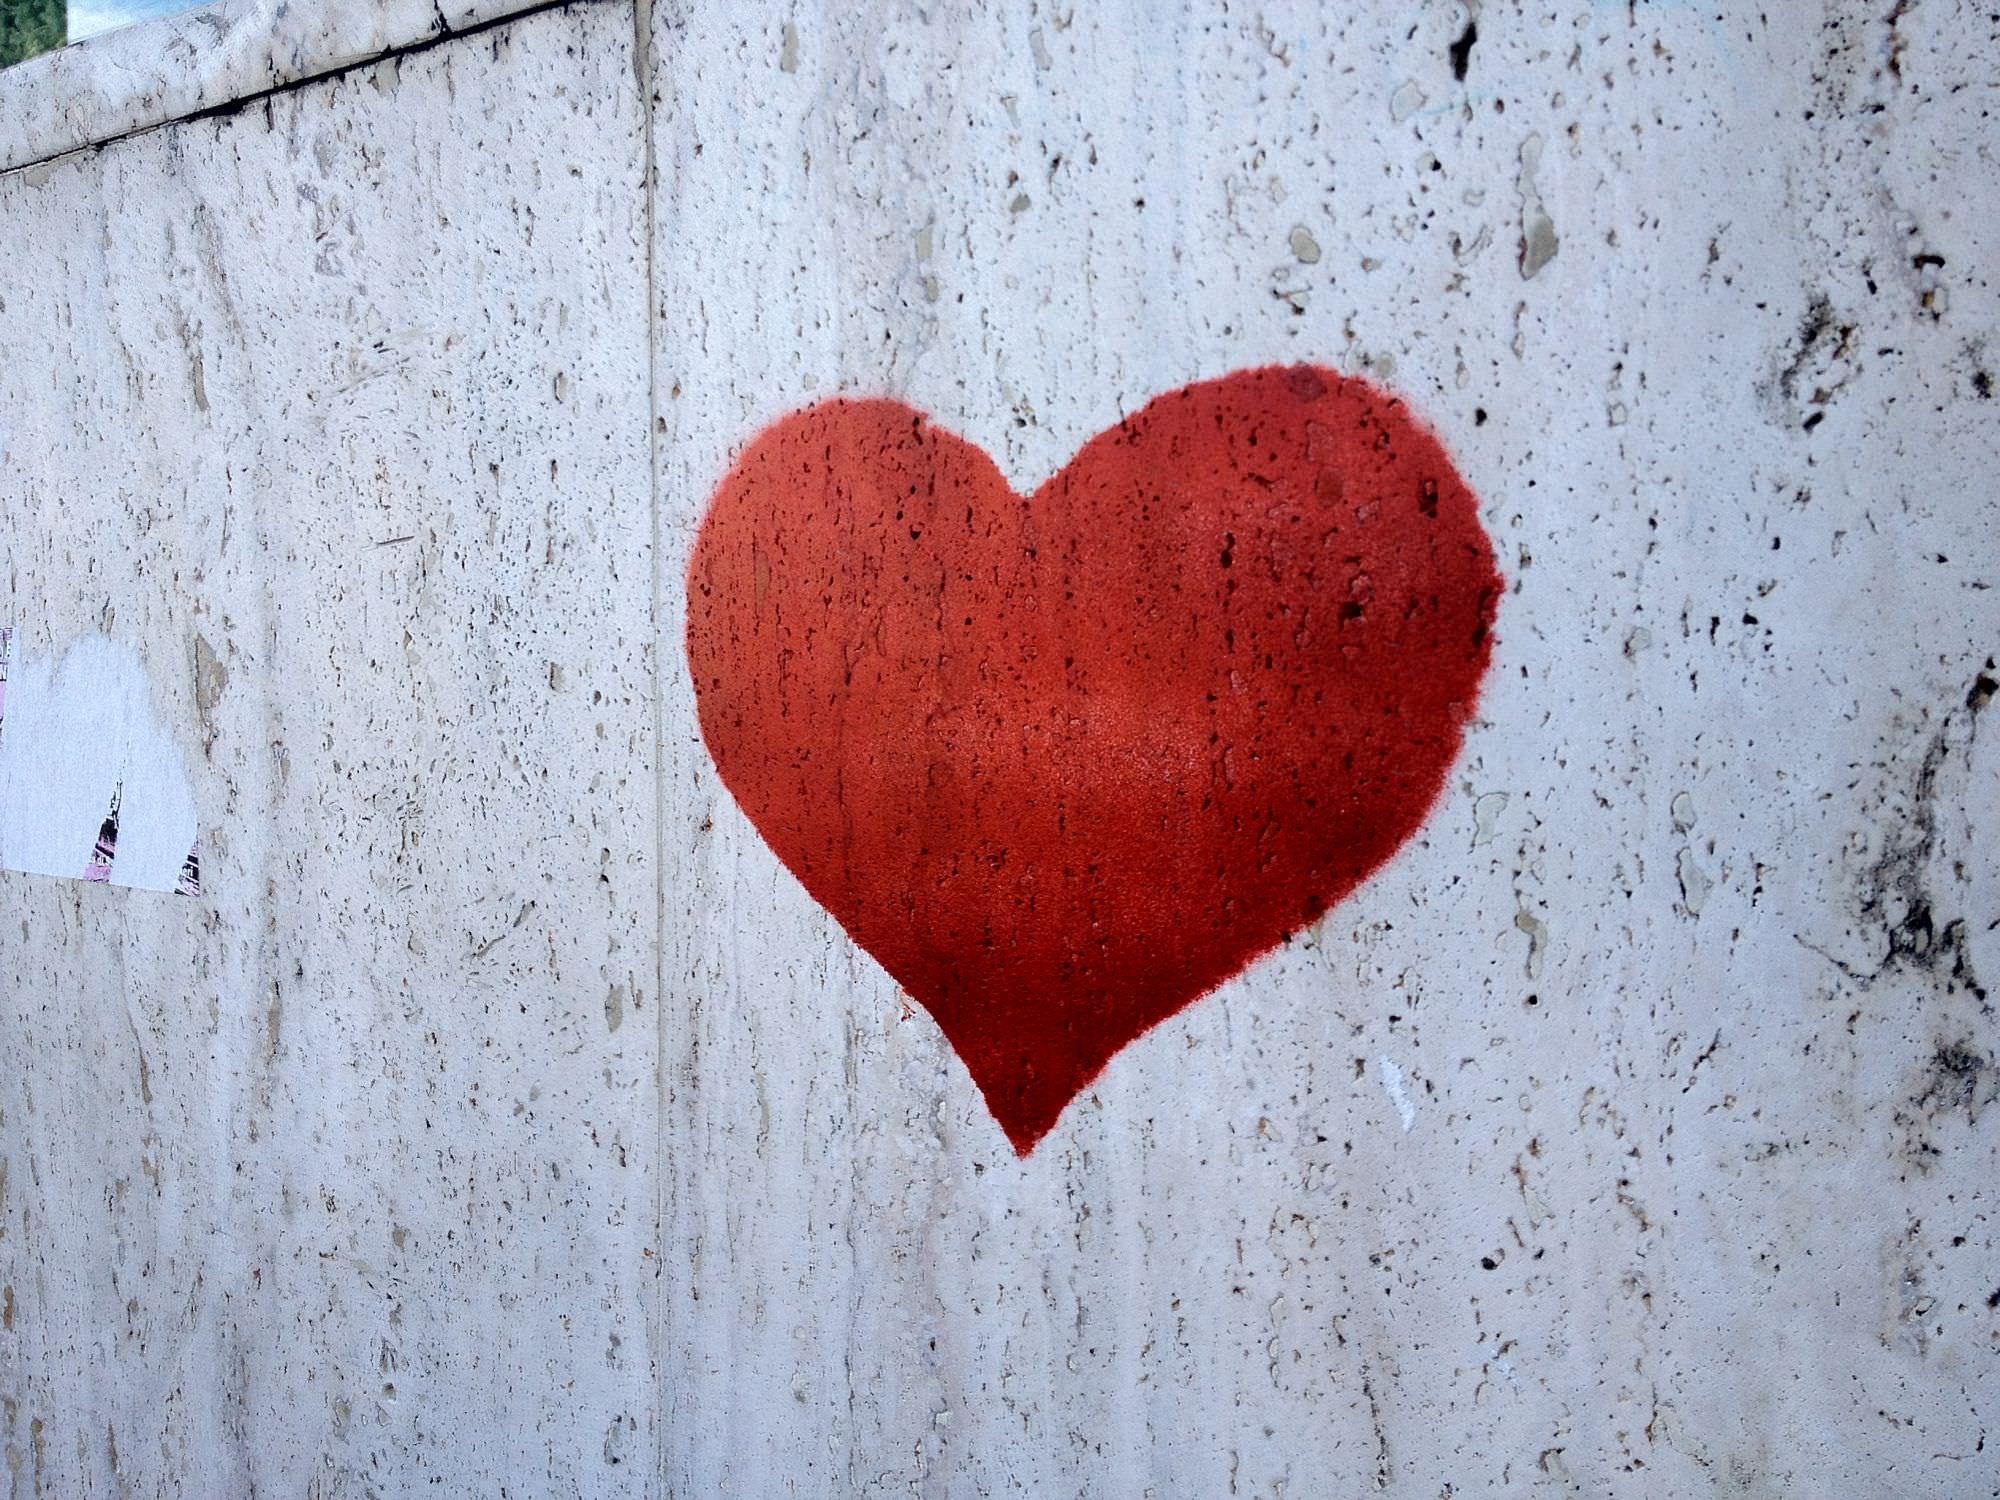 Lettere d'amore, letture e suggestioni a Villa Argentina